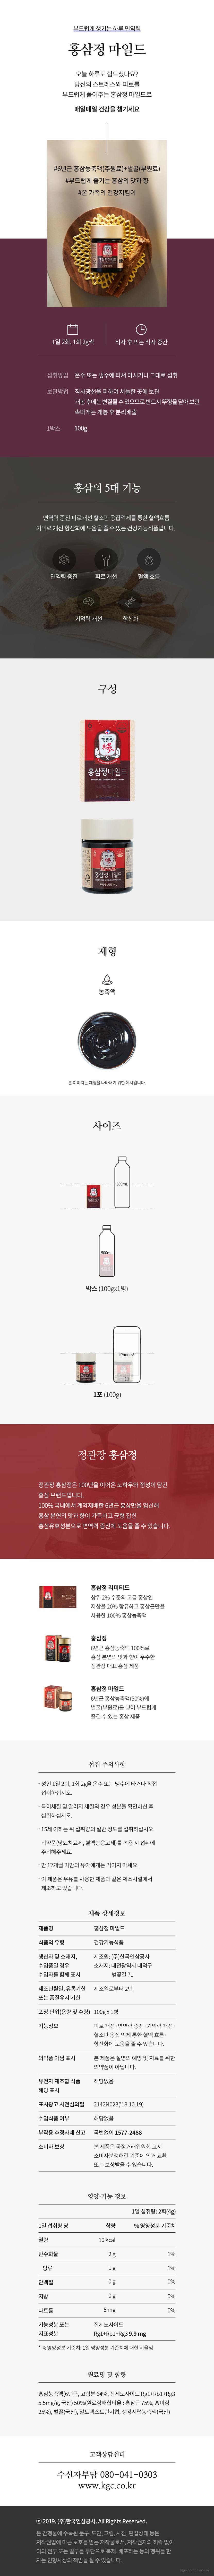 P_홍삼정마일드100g_쇼핑백x.jpg